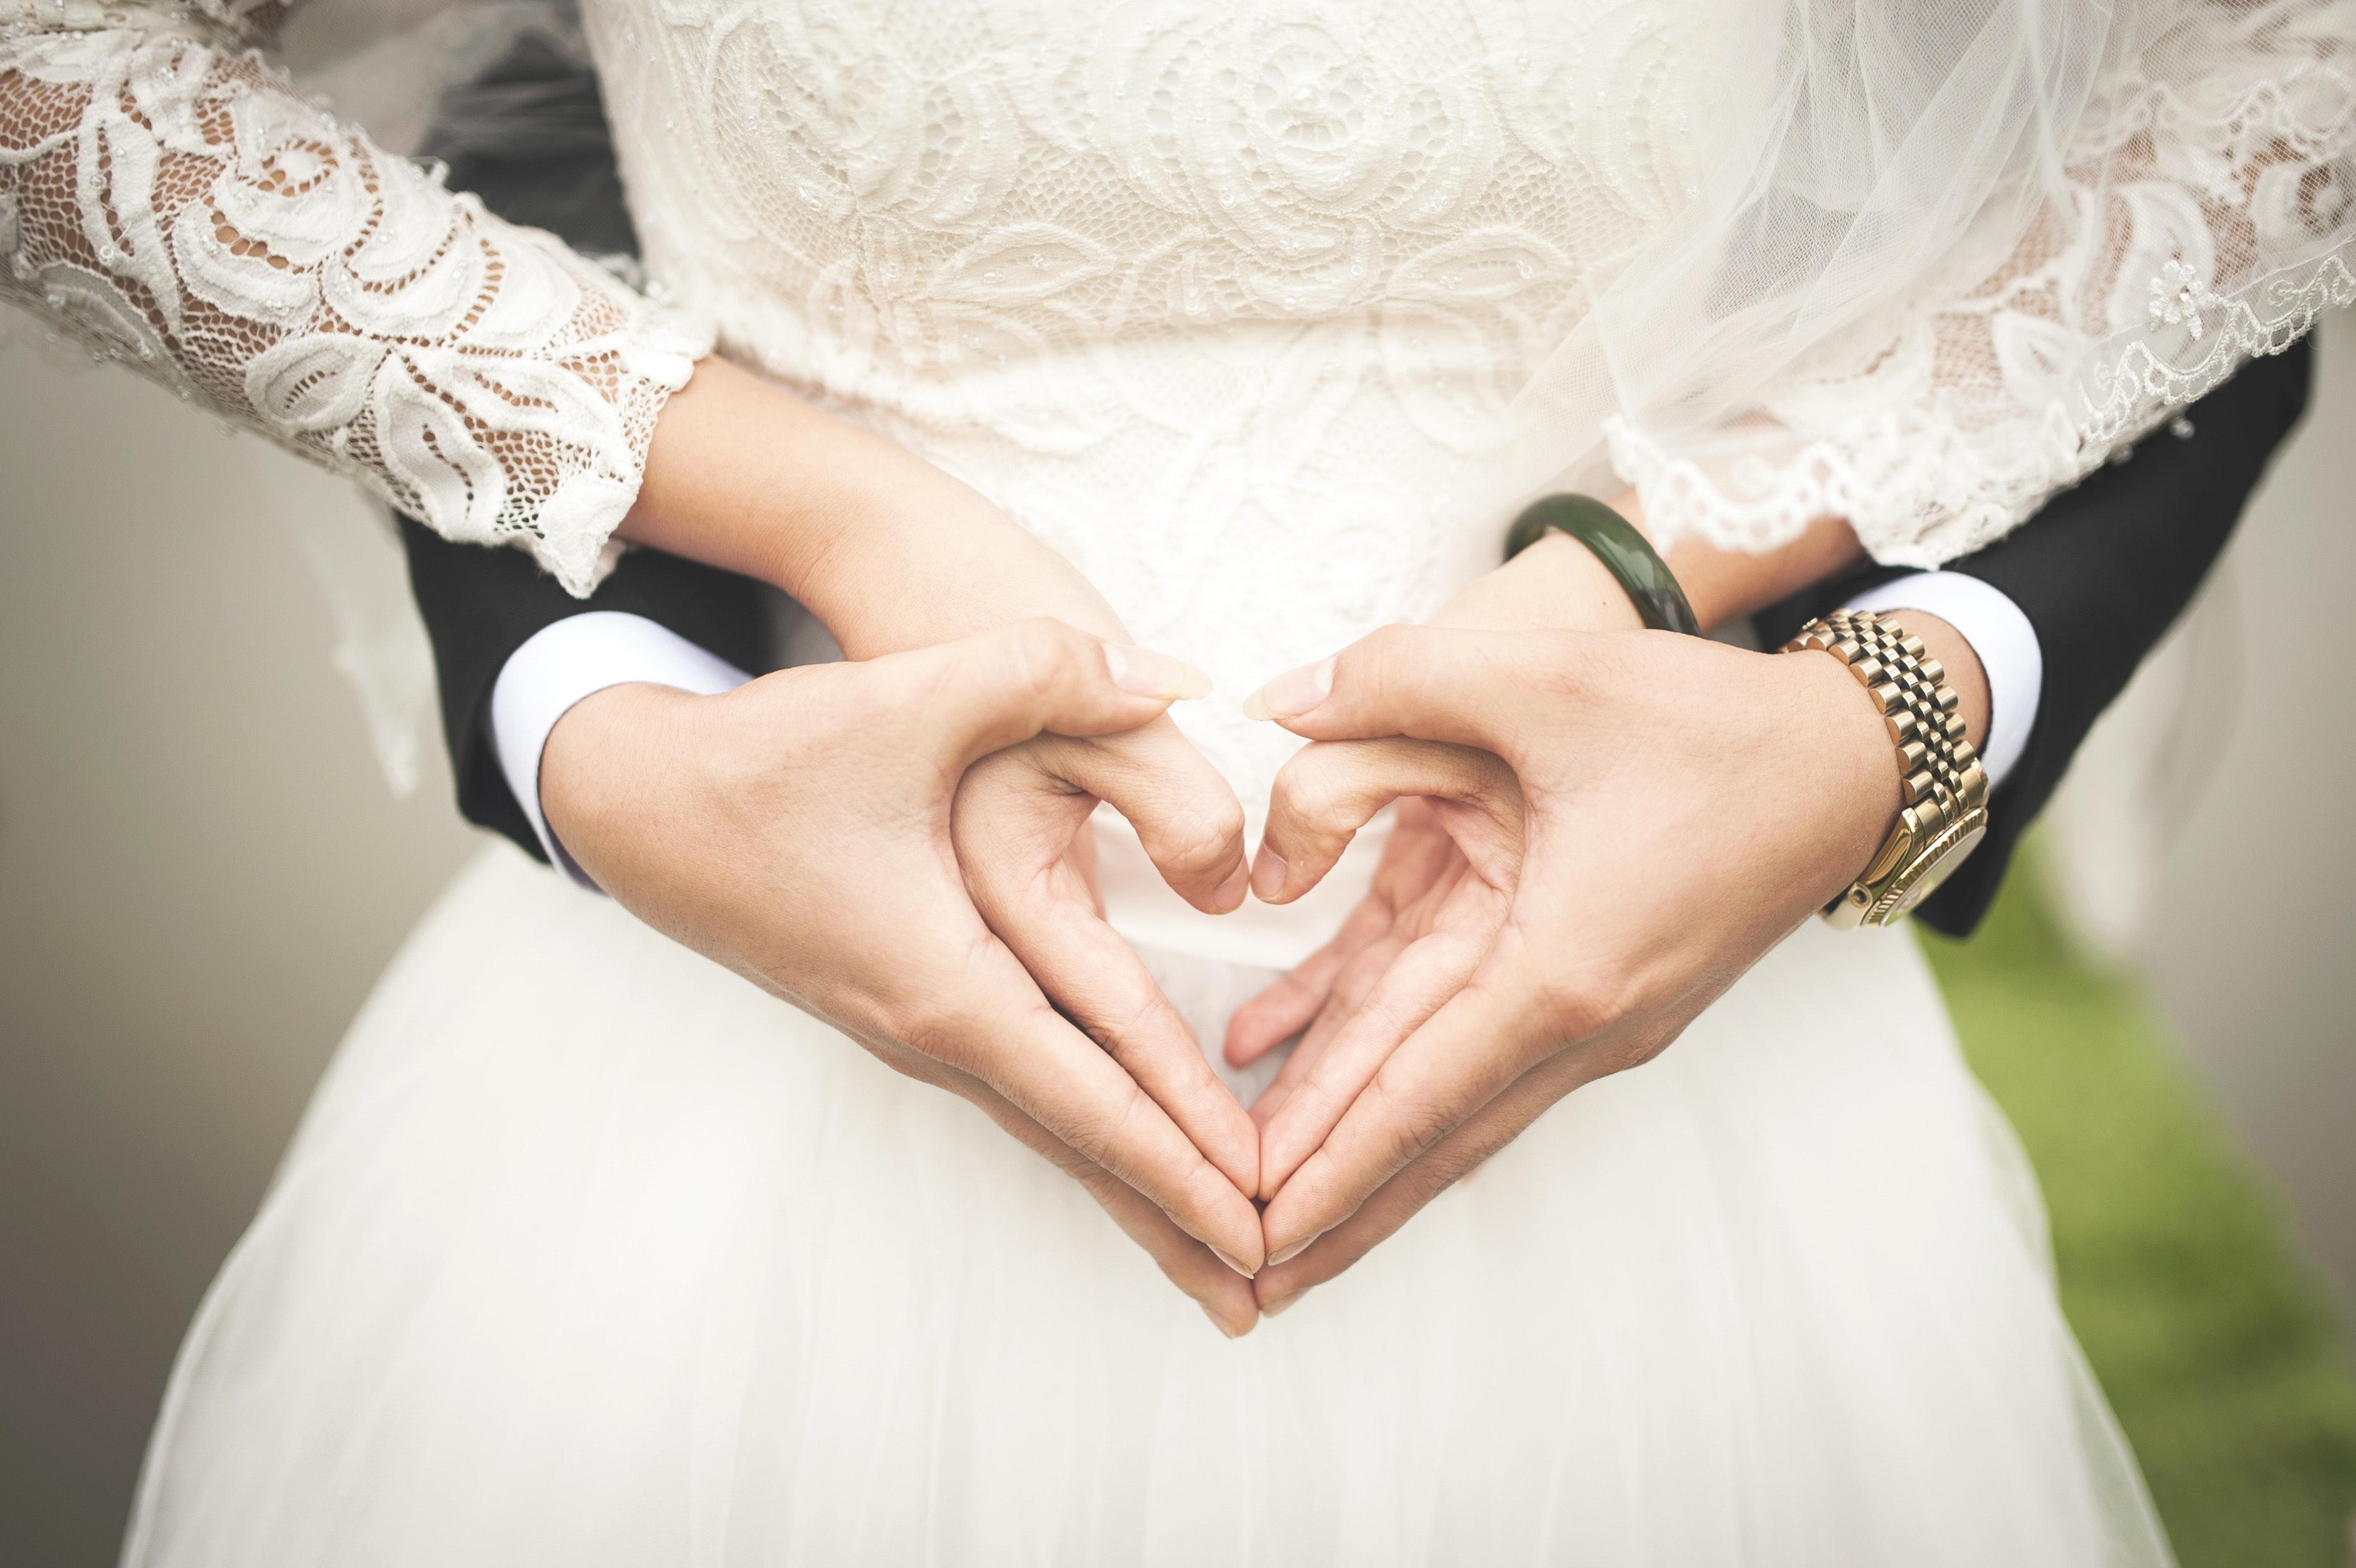 Organiser un mariage de rêve pas cher